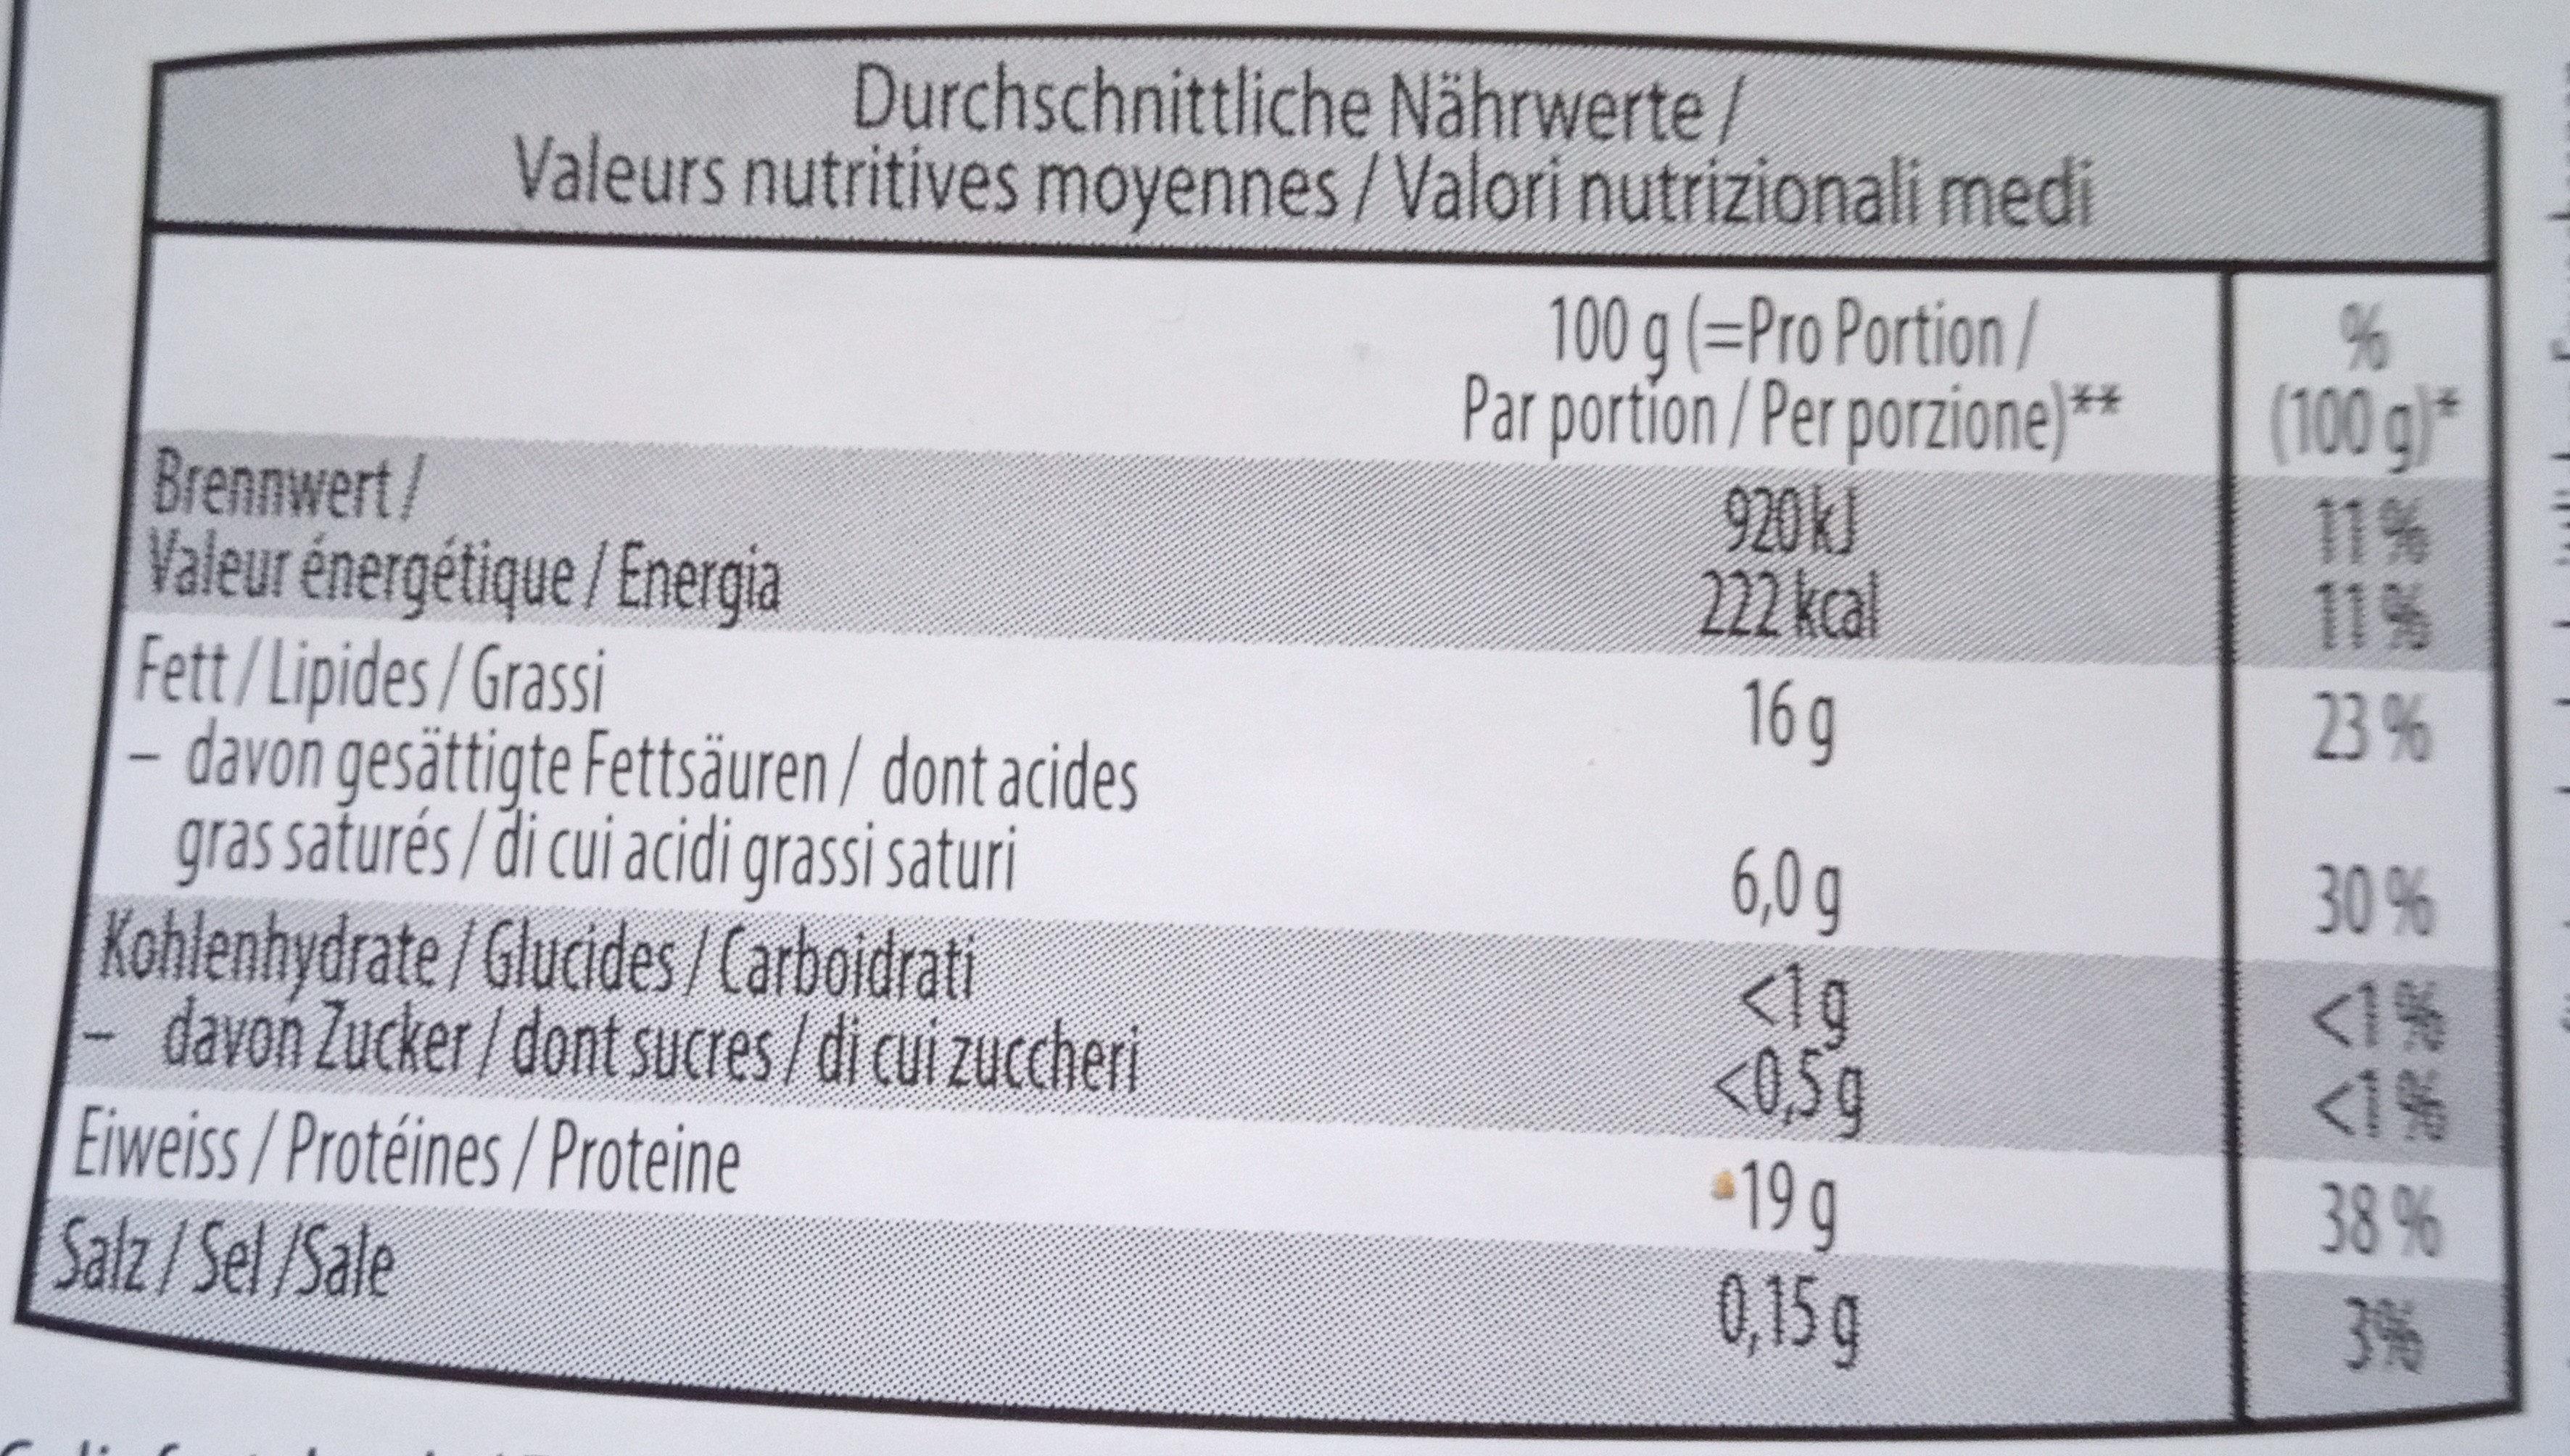 Viande hachée de boeuf - Voedingswaarden - fr